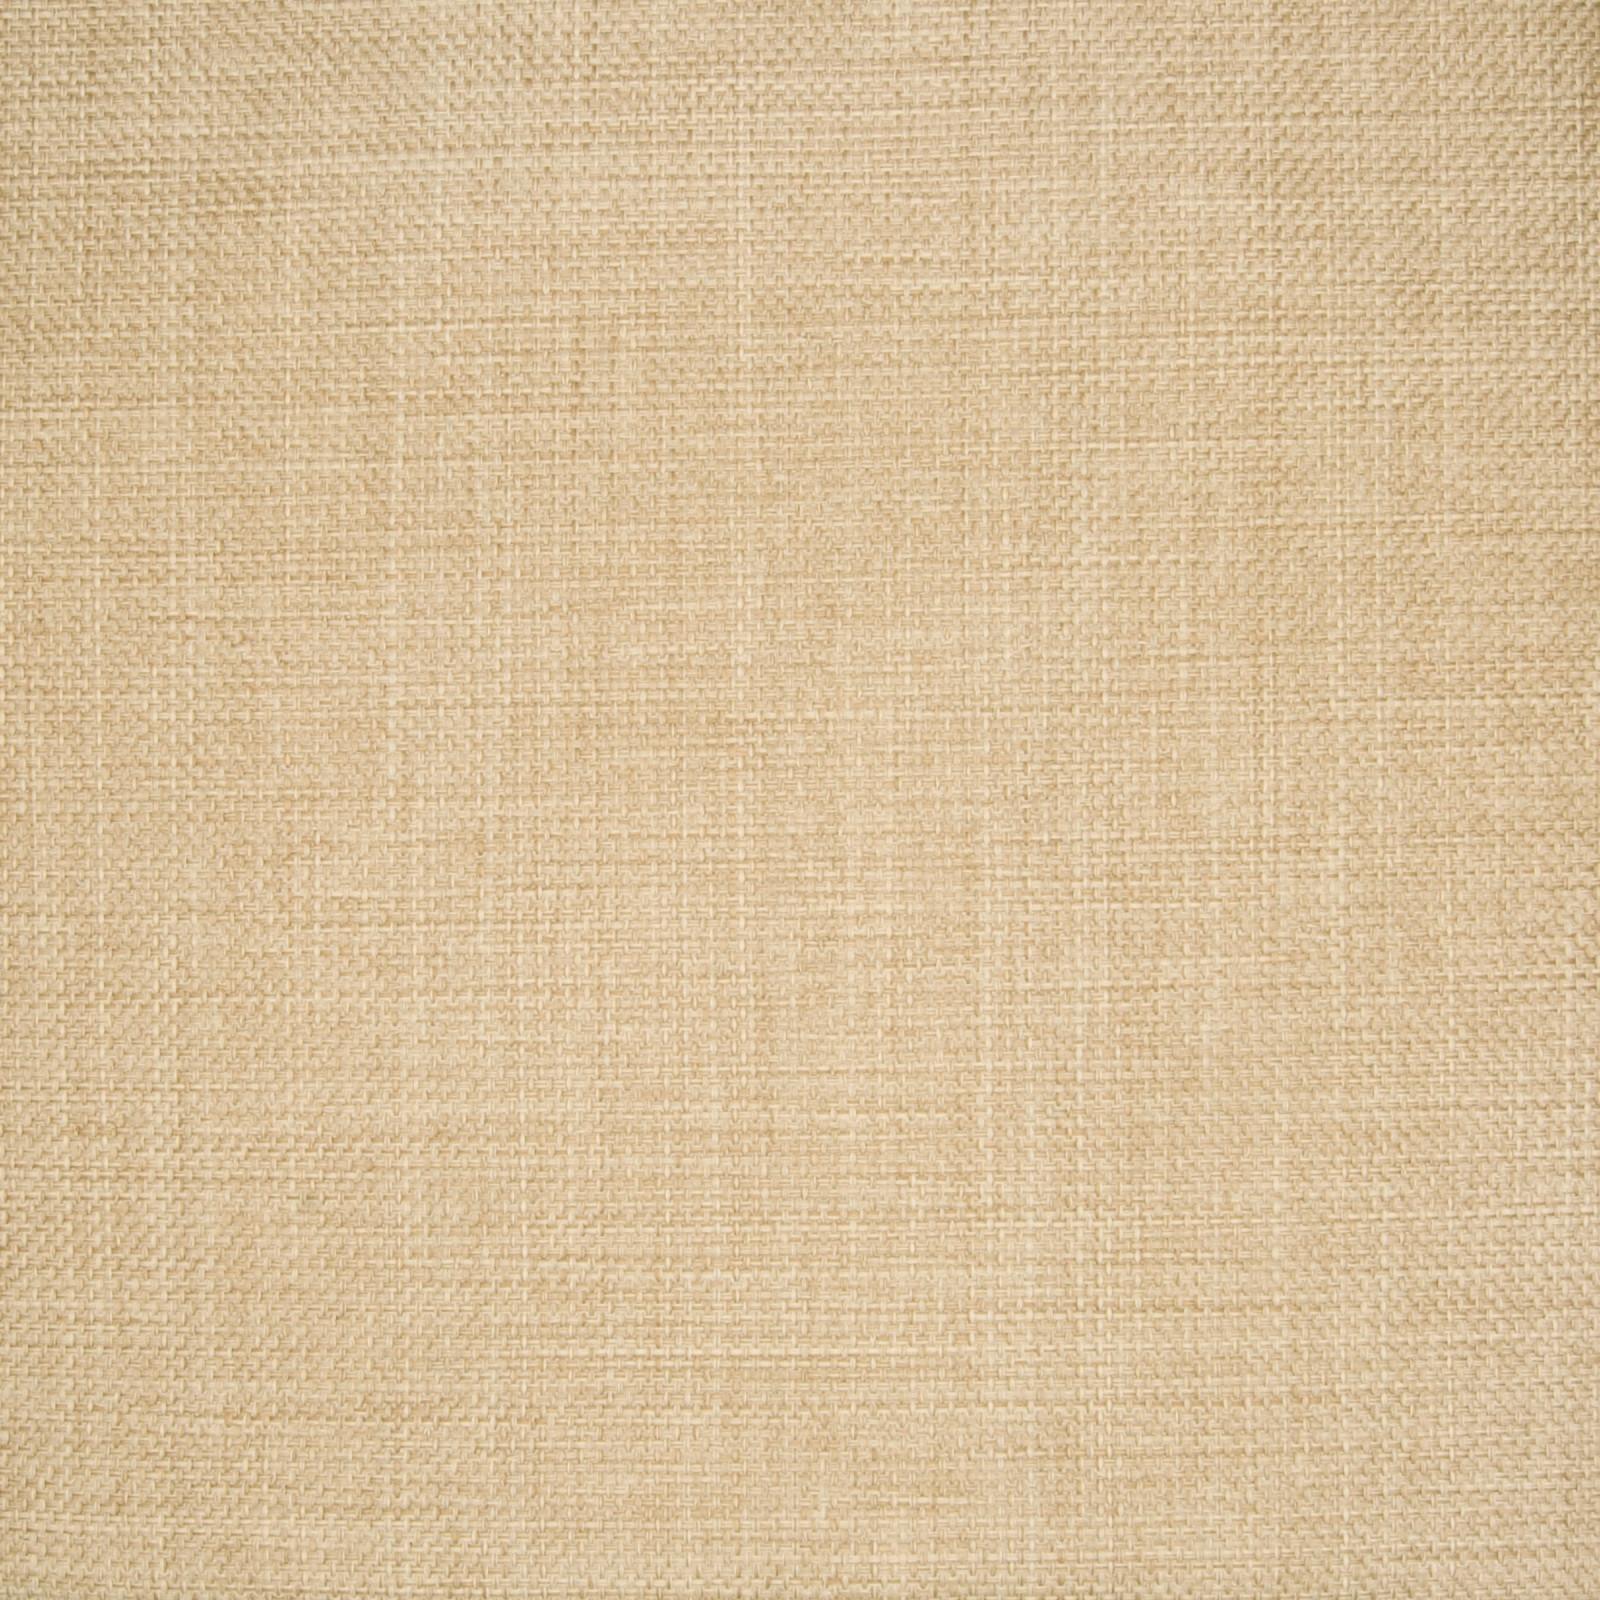 B1954 Jute Greenhouse Fabrics